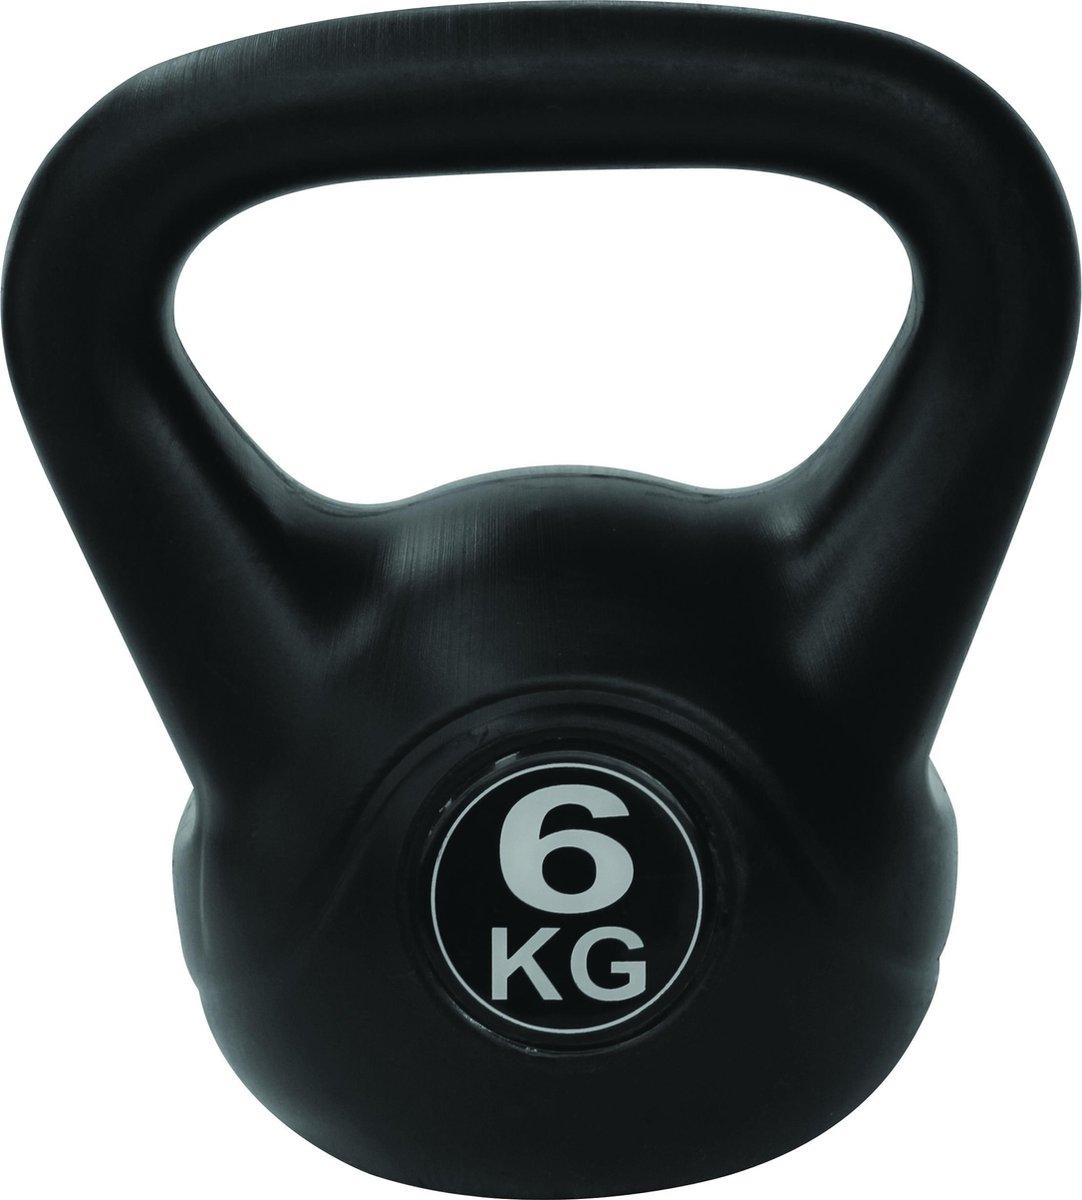 Tunturi PVC Kettle Bell - Kettlebell - 6 kg - Tunturi